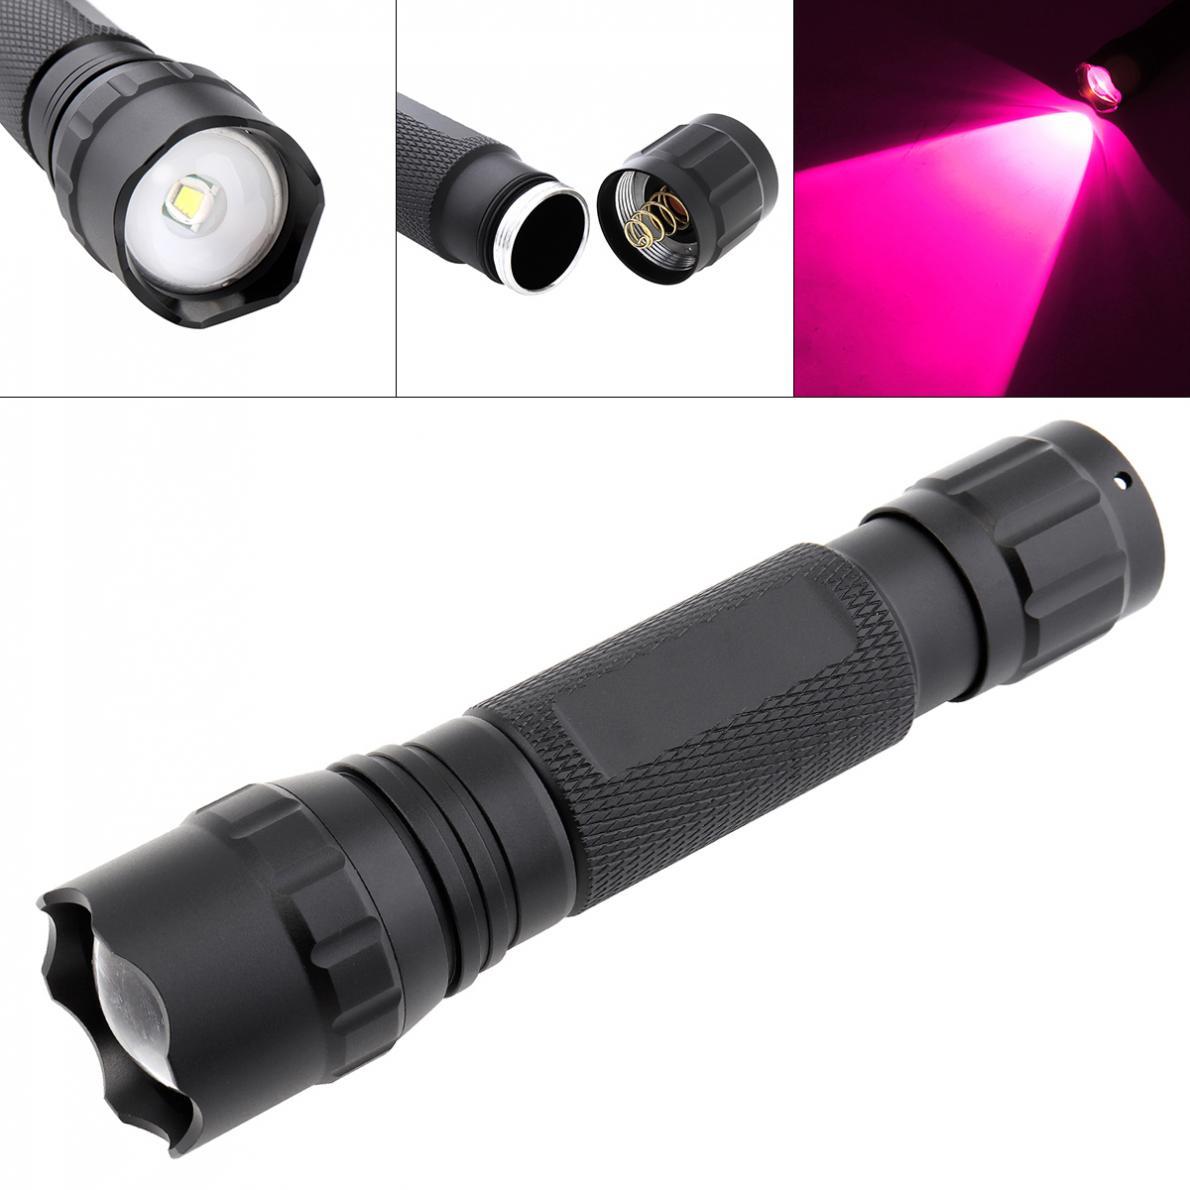 Linterna LED 2000LM 502B Mini LED infrarrojo IR 850nm visión nocturna Zoom linterna impermeable antorcha para la caza al aire libre Camping